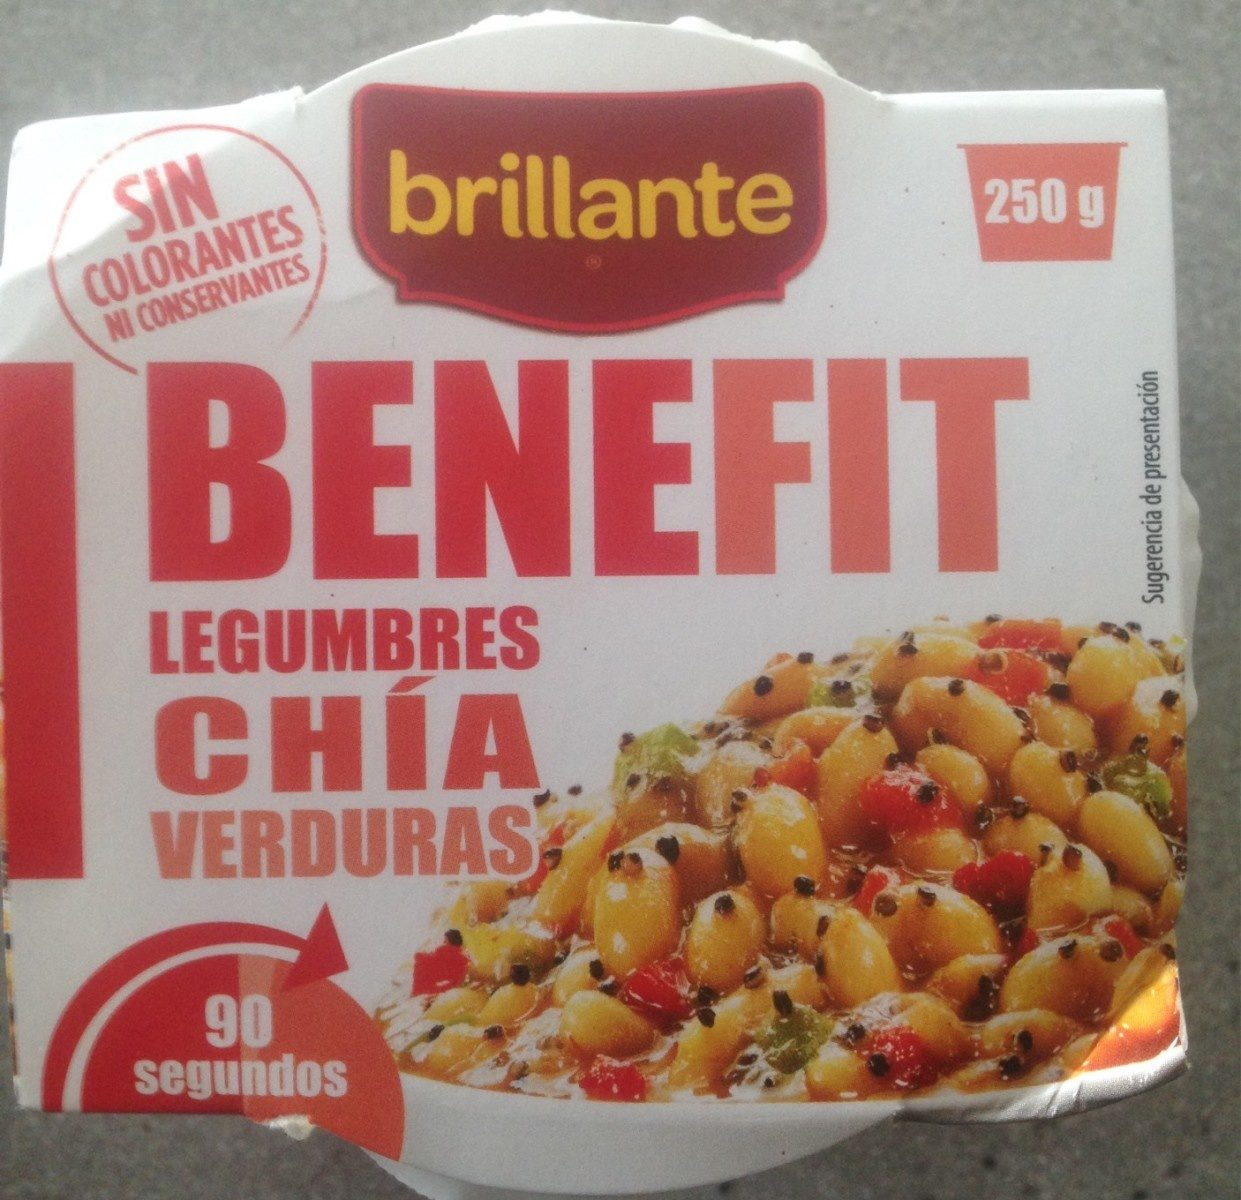 Benefit legumbres chía verduras - Produit - fr